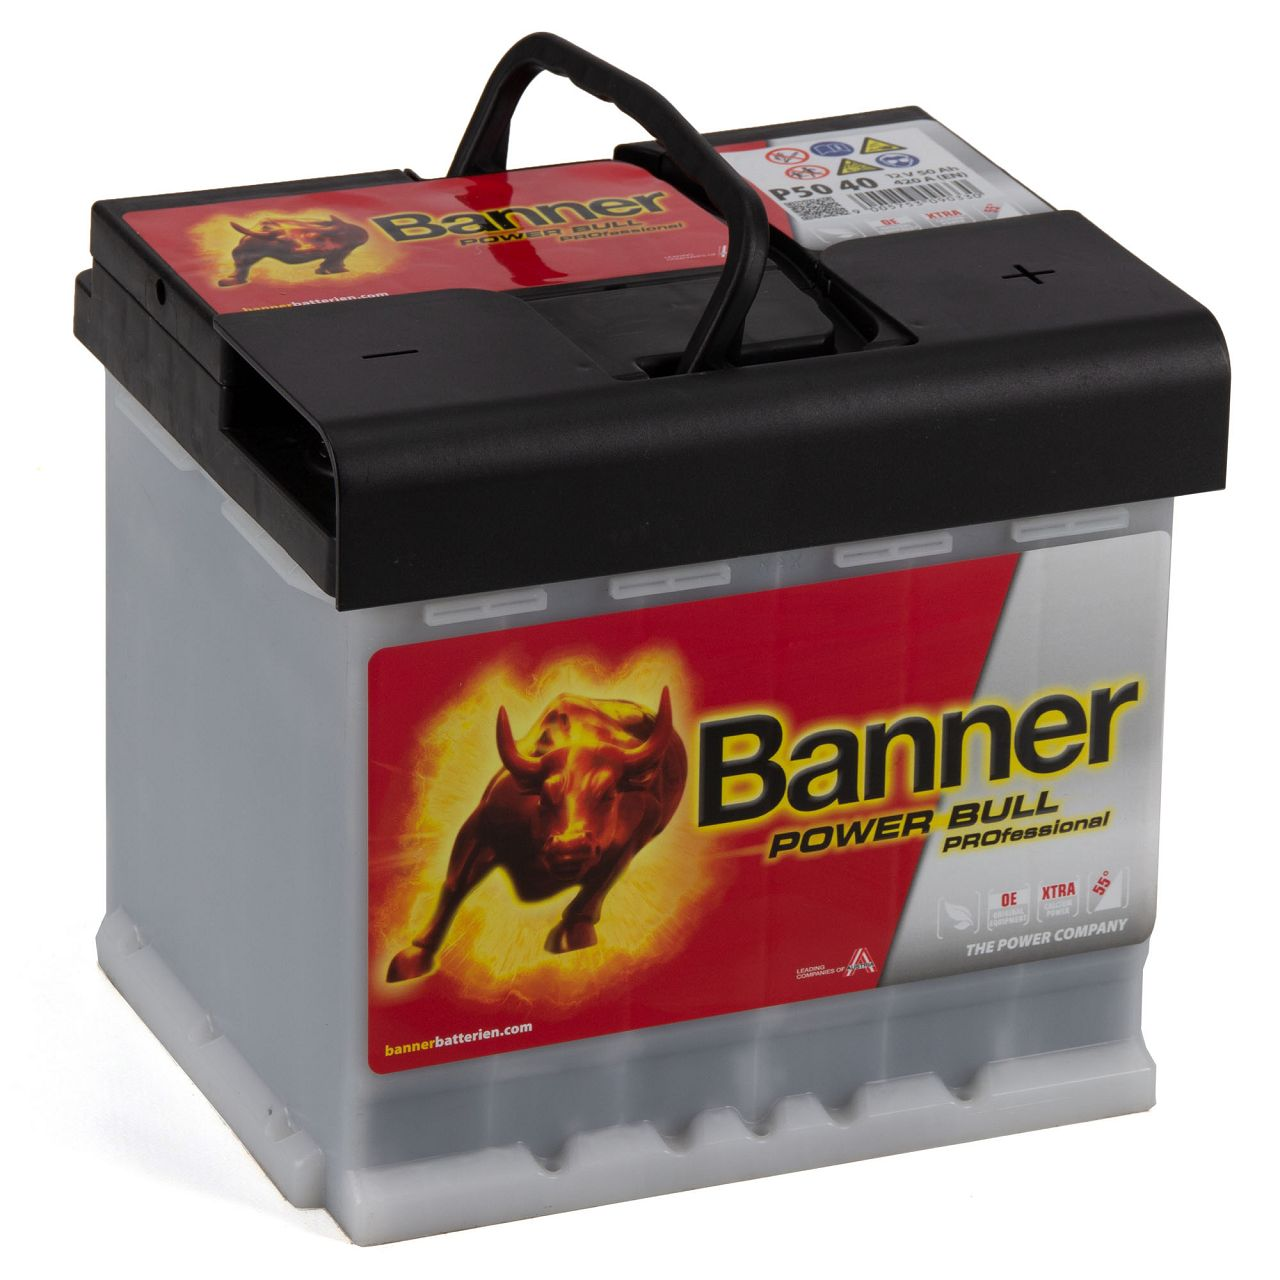 BANNER PROP5040 PRO P5040 Power Bull Professional Autobatterie Batterie 12V 50Ah